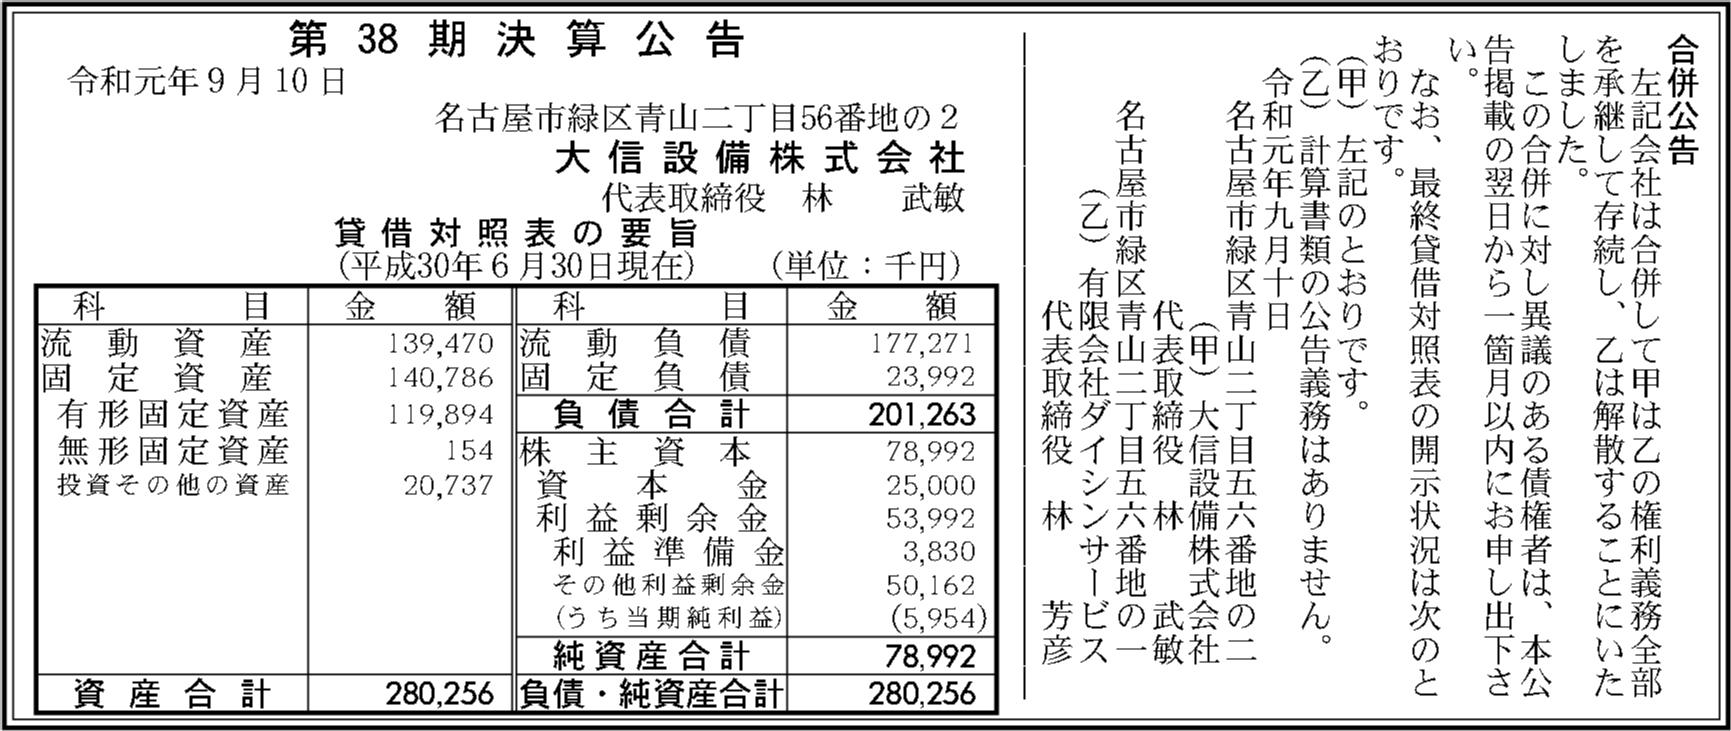 0095 2940744e5654993e9efdcfacbef5e9bdef23b121a78418662906209c7020c4bfa52b87a416c8ba3e6557b48645a4ce75b1144b222a7dea048b96a9c4bac2ad79 06